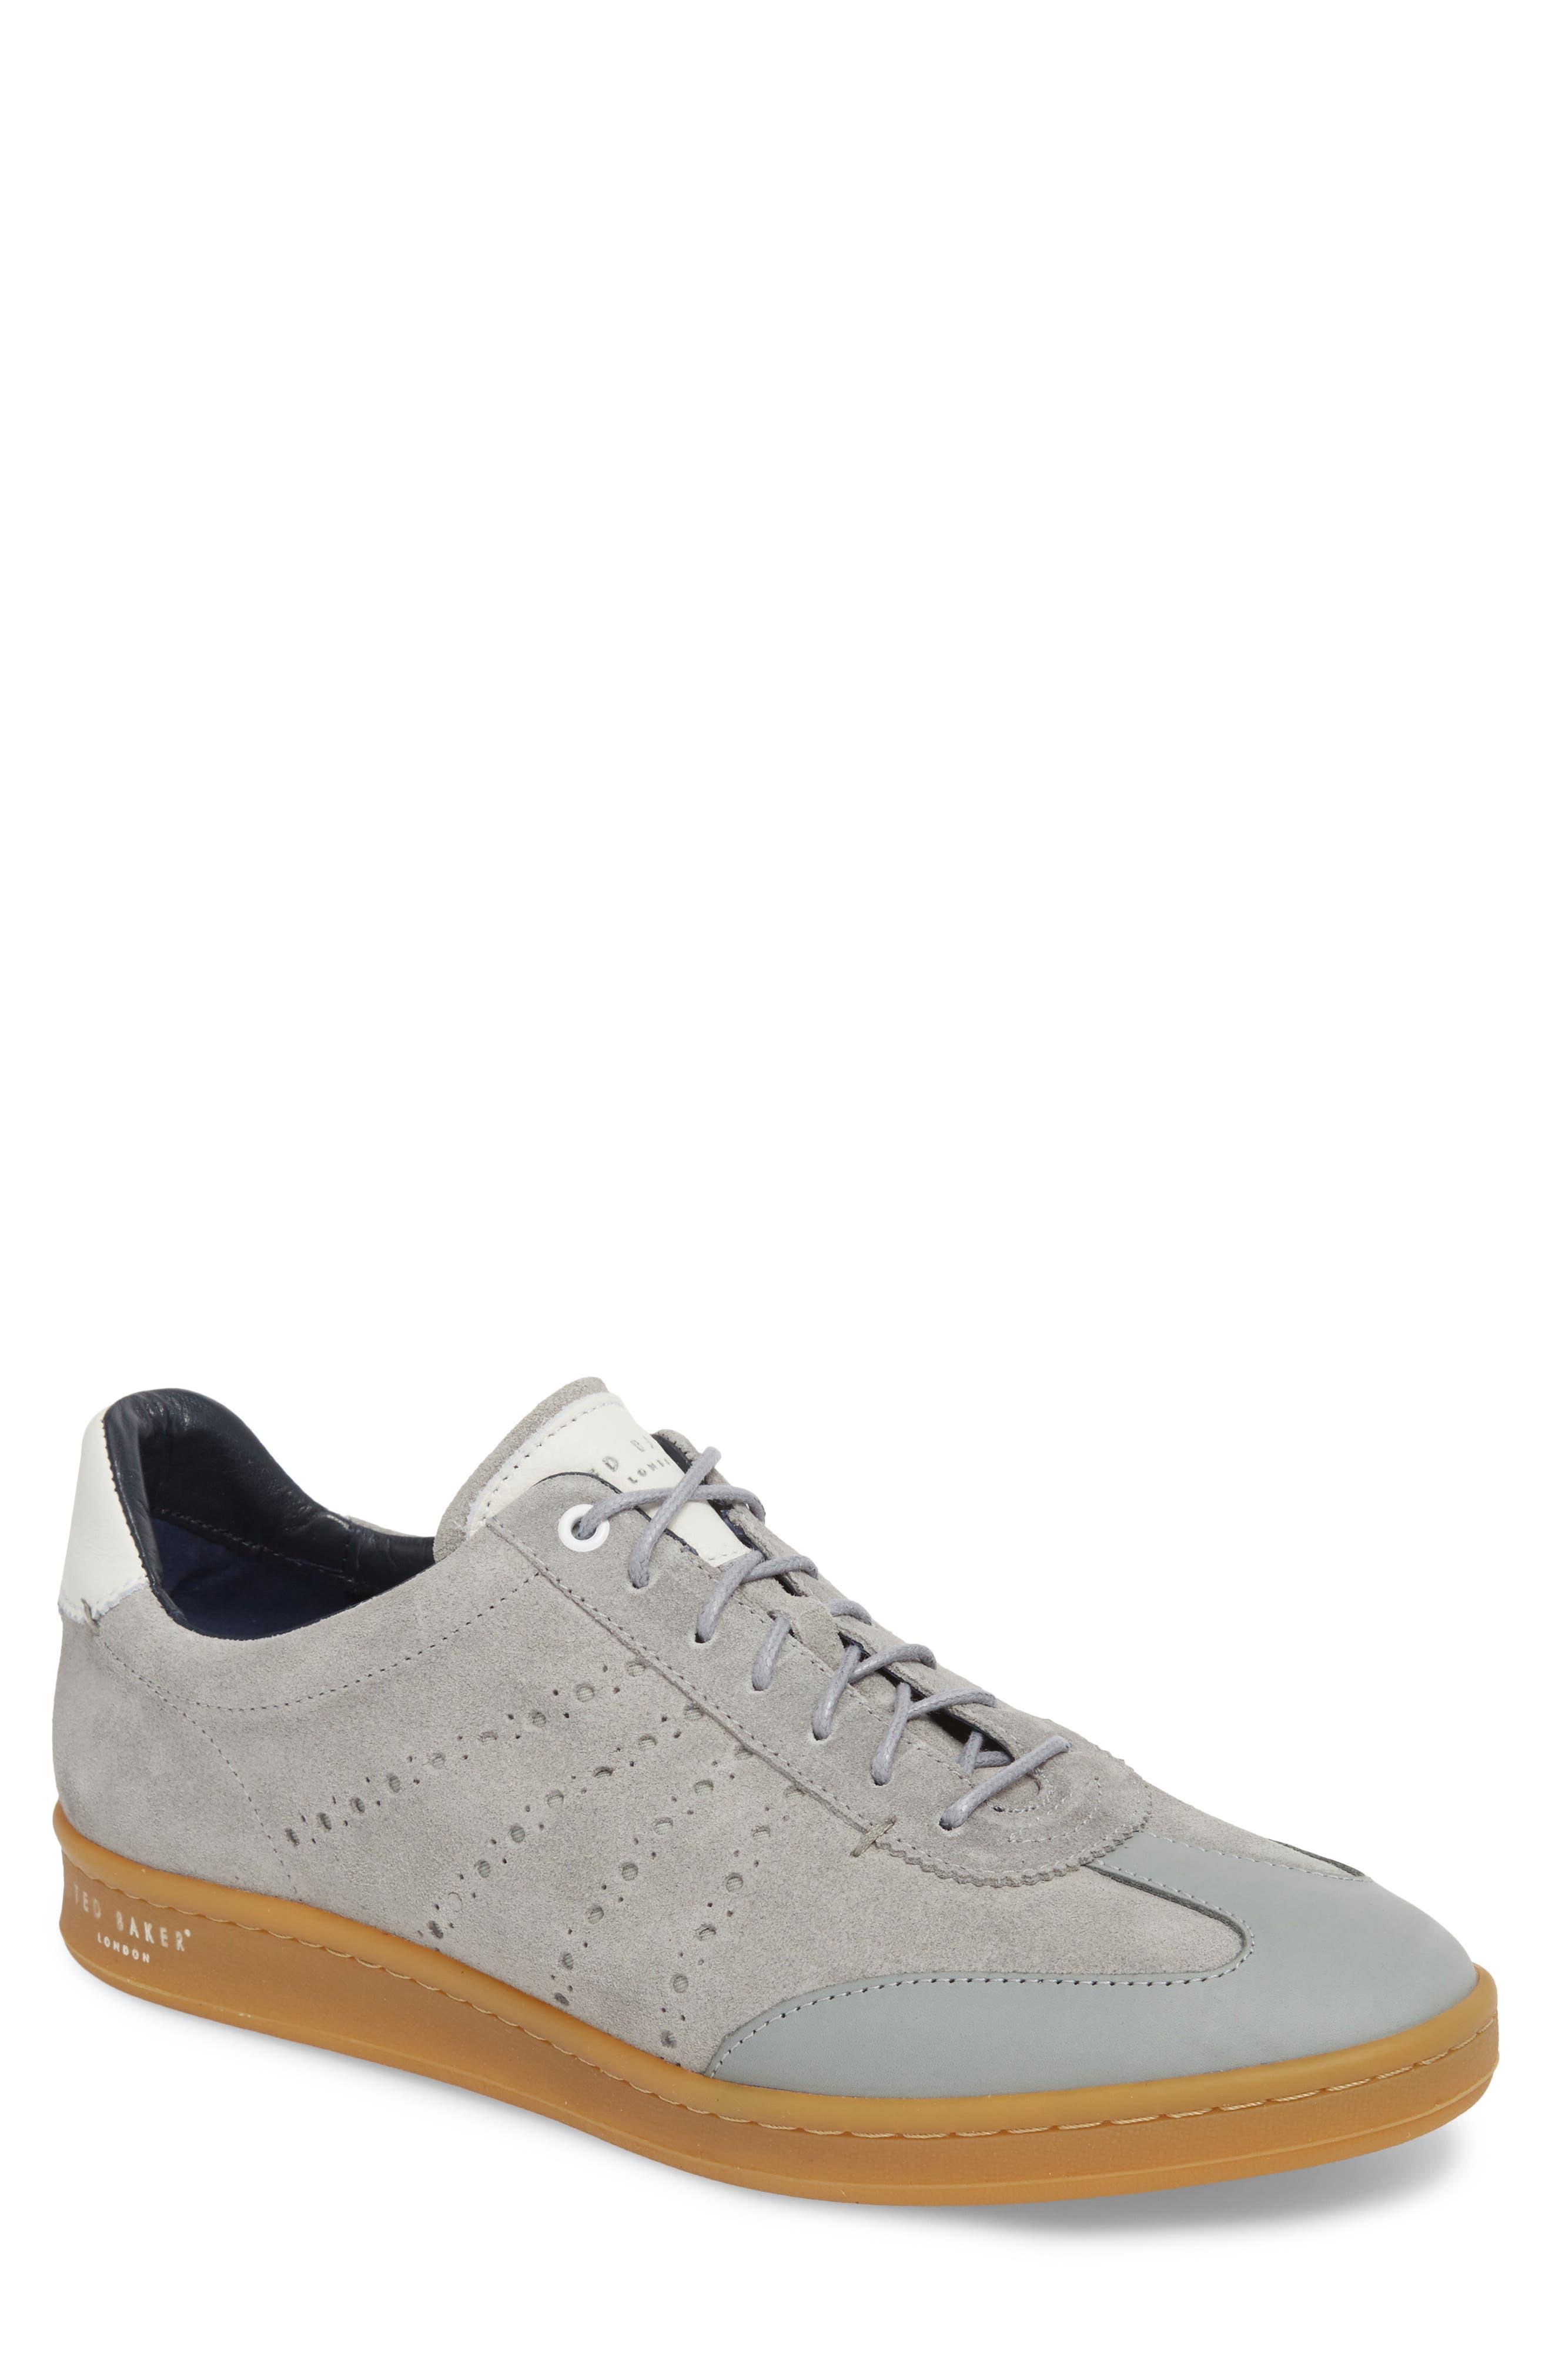 Orlees Low Top Sneaker,                         Main,                         color, 052